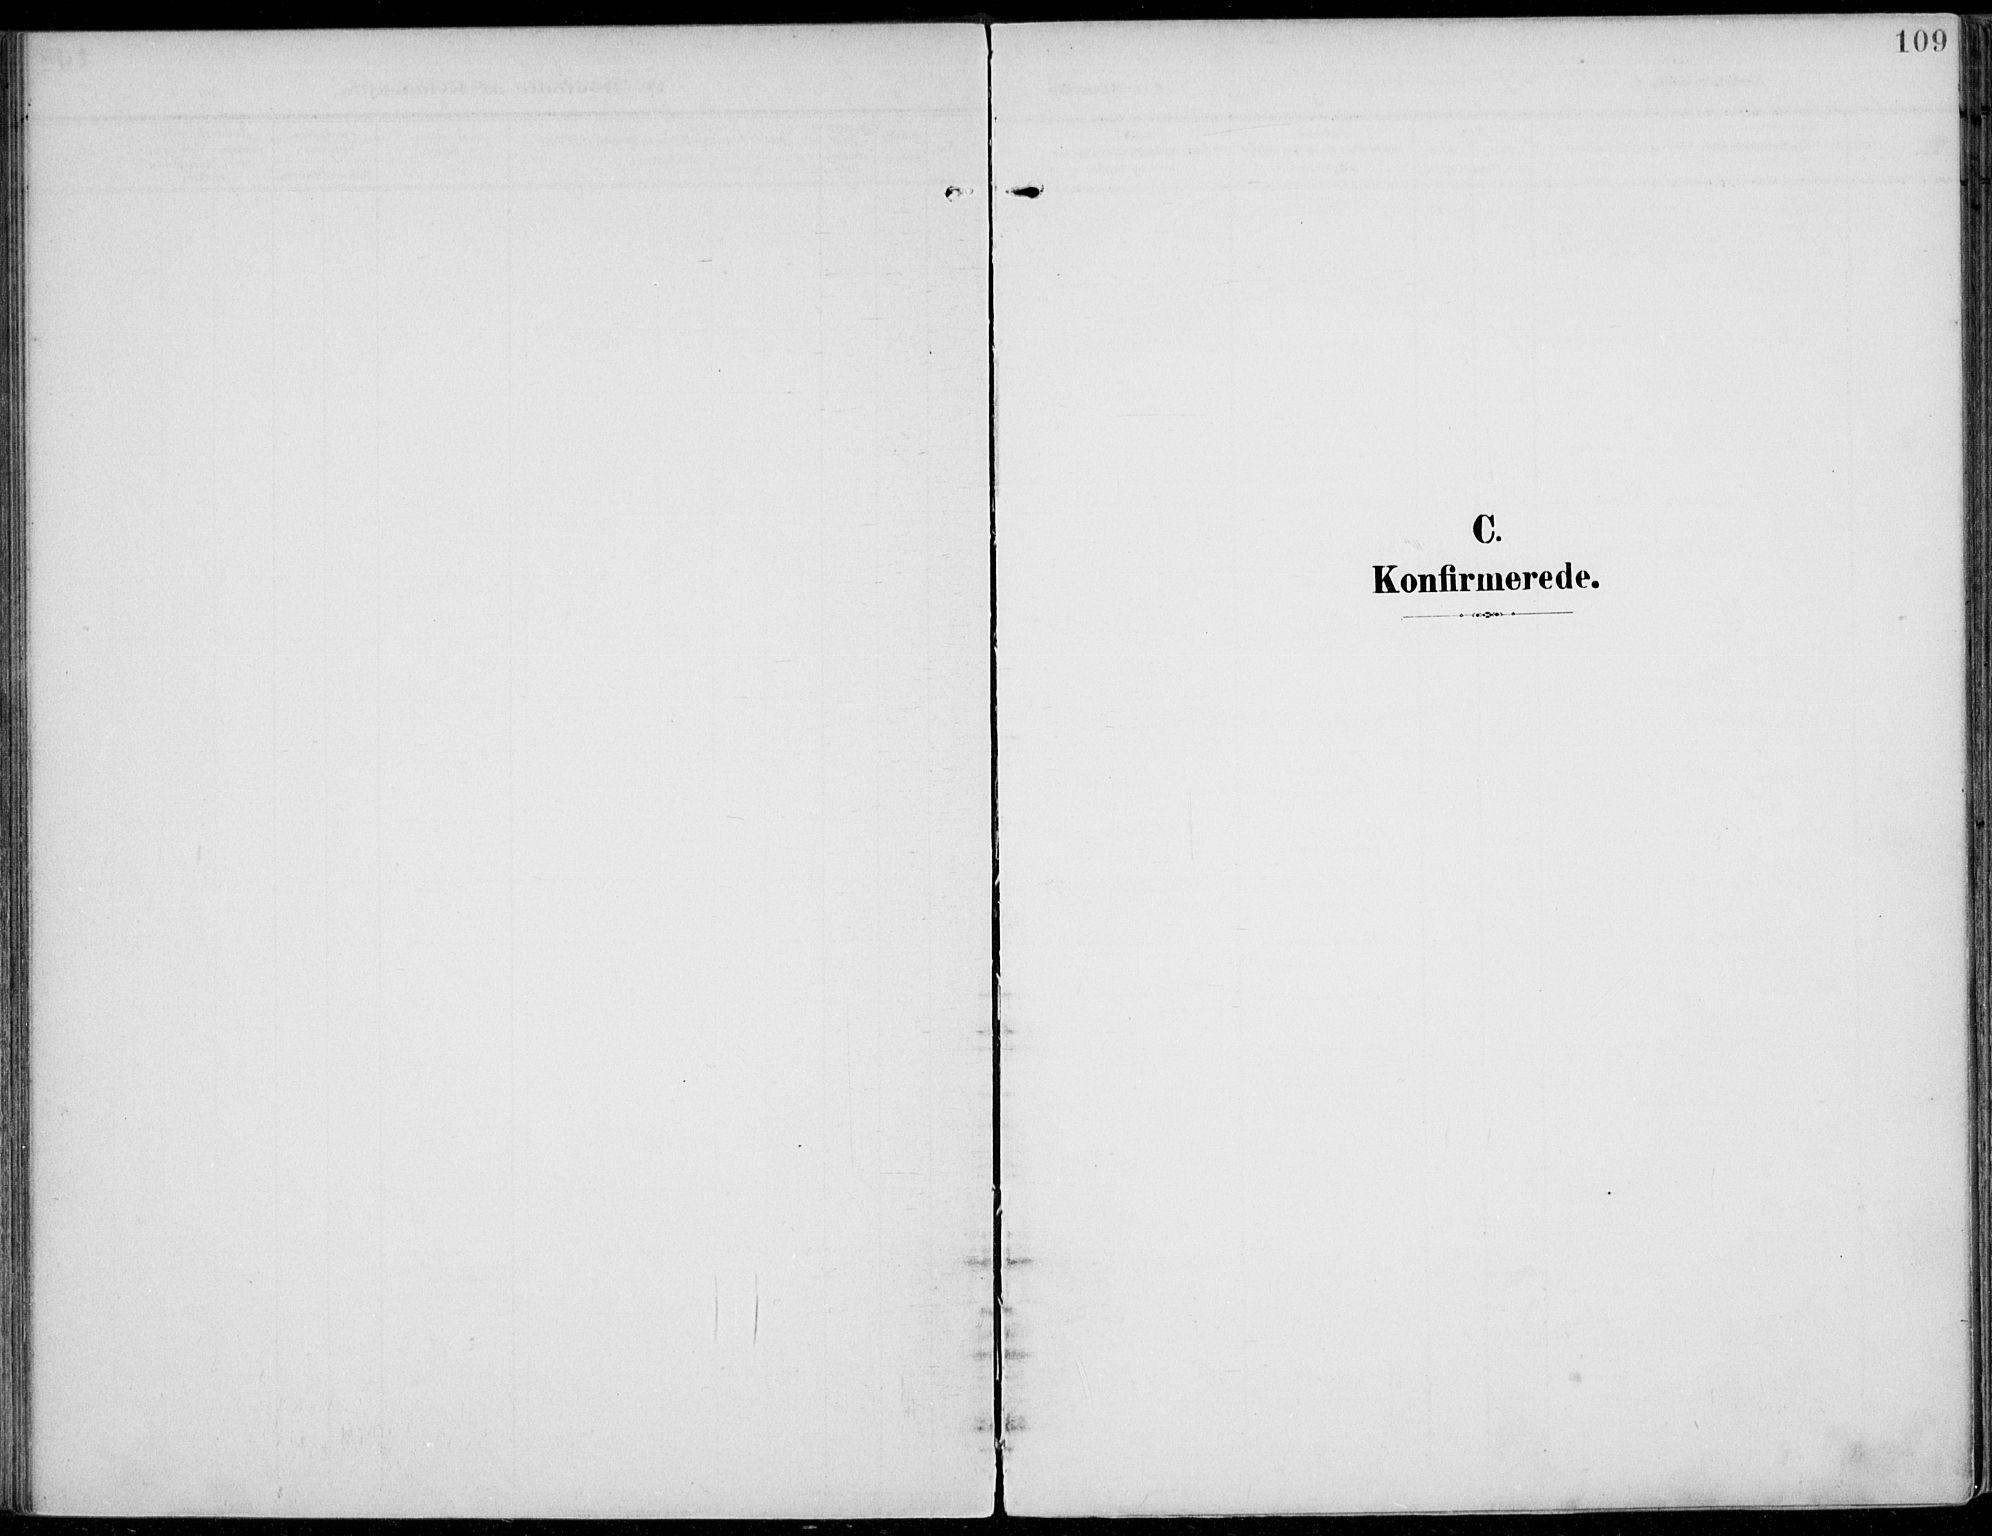 SAH, Jevnaker prestekontor, Ministerialbok nr. 11, 1902-1913, s. 109